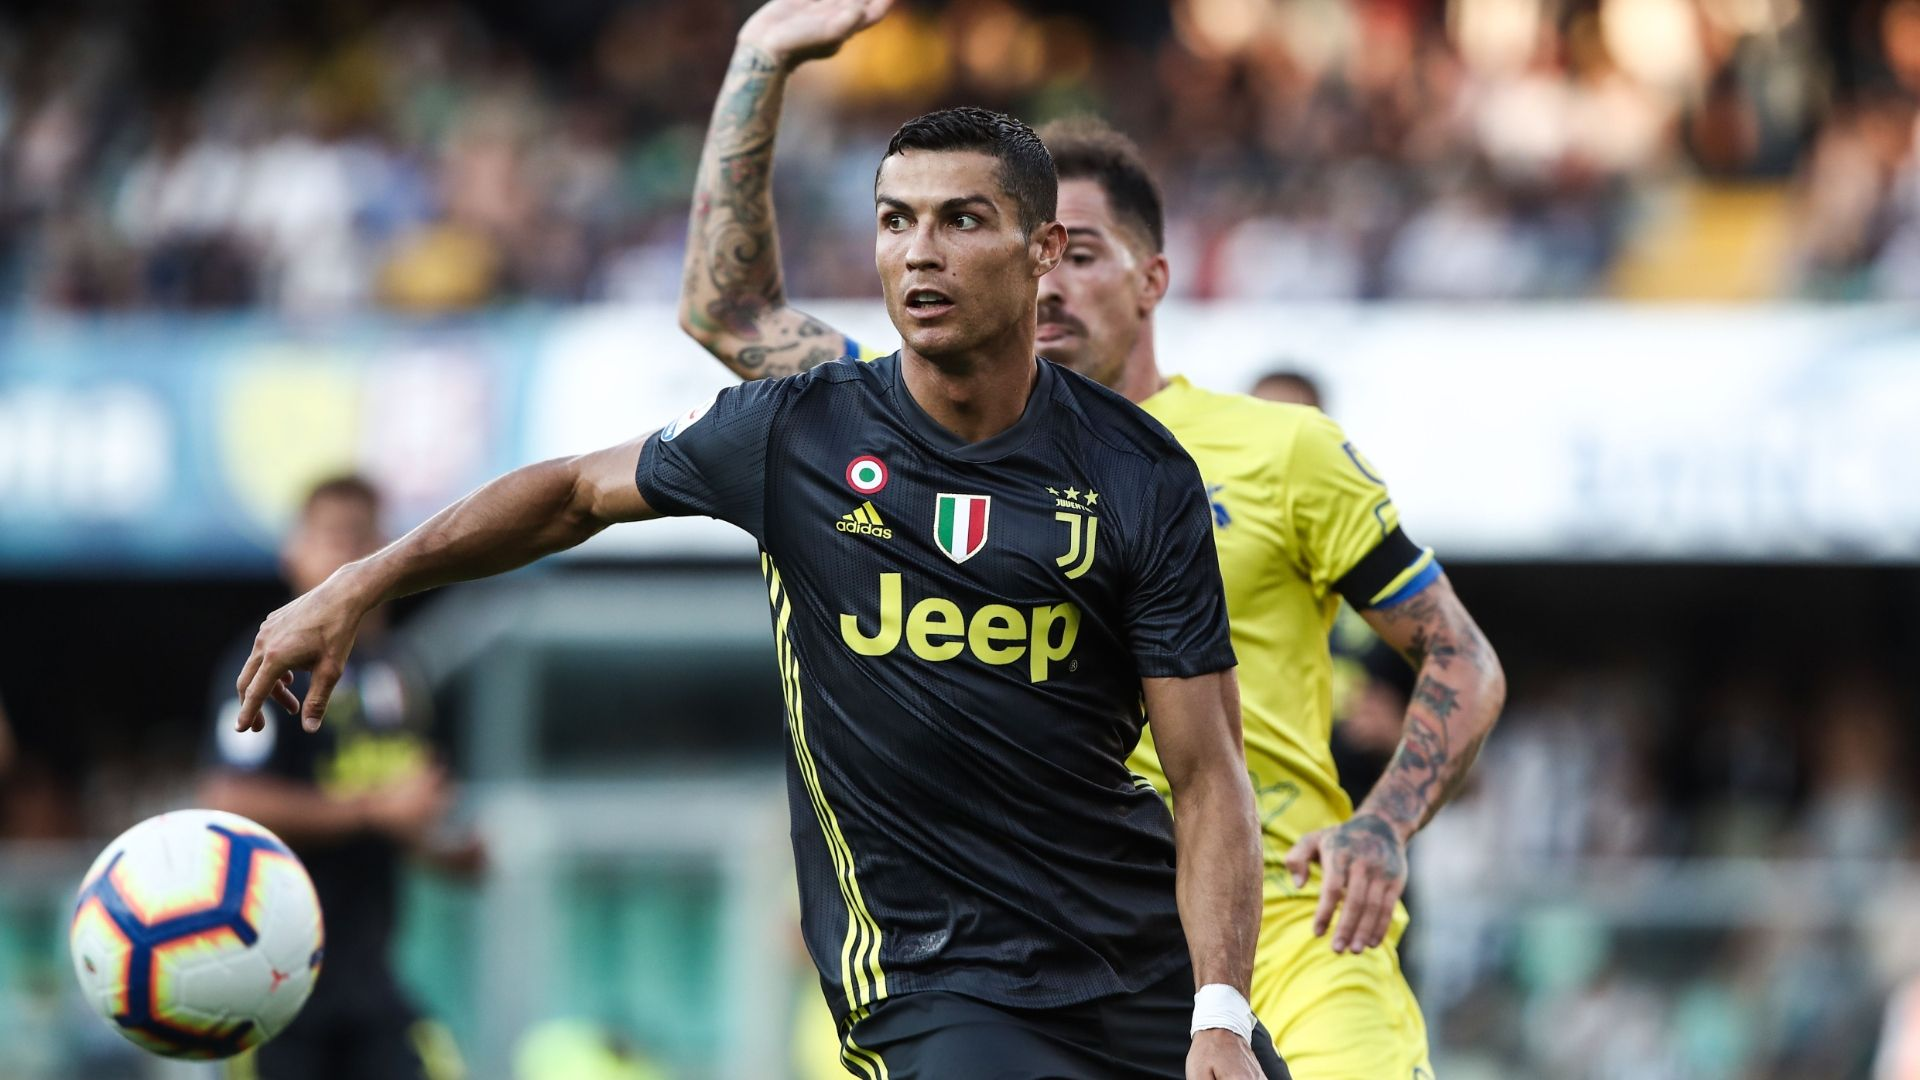 Cristiano Ronaldo Juventus debut vs. Chievo